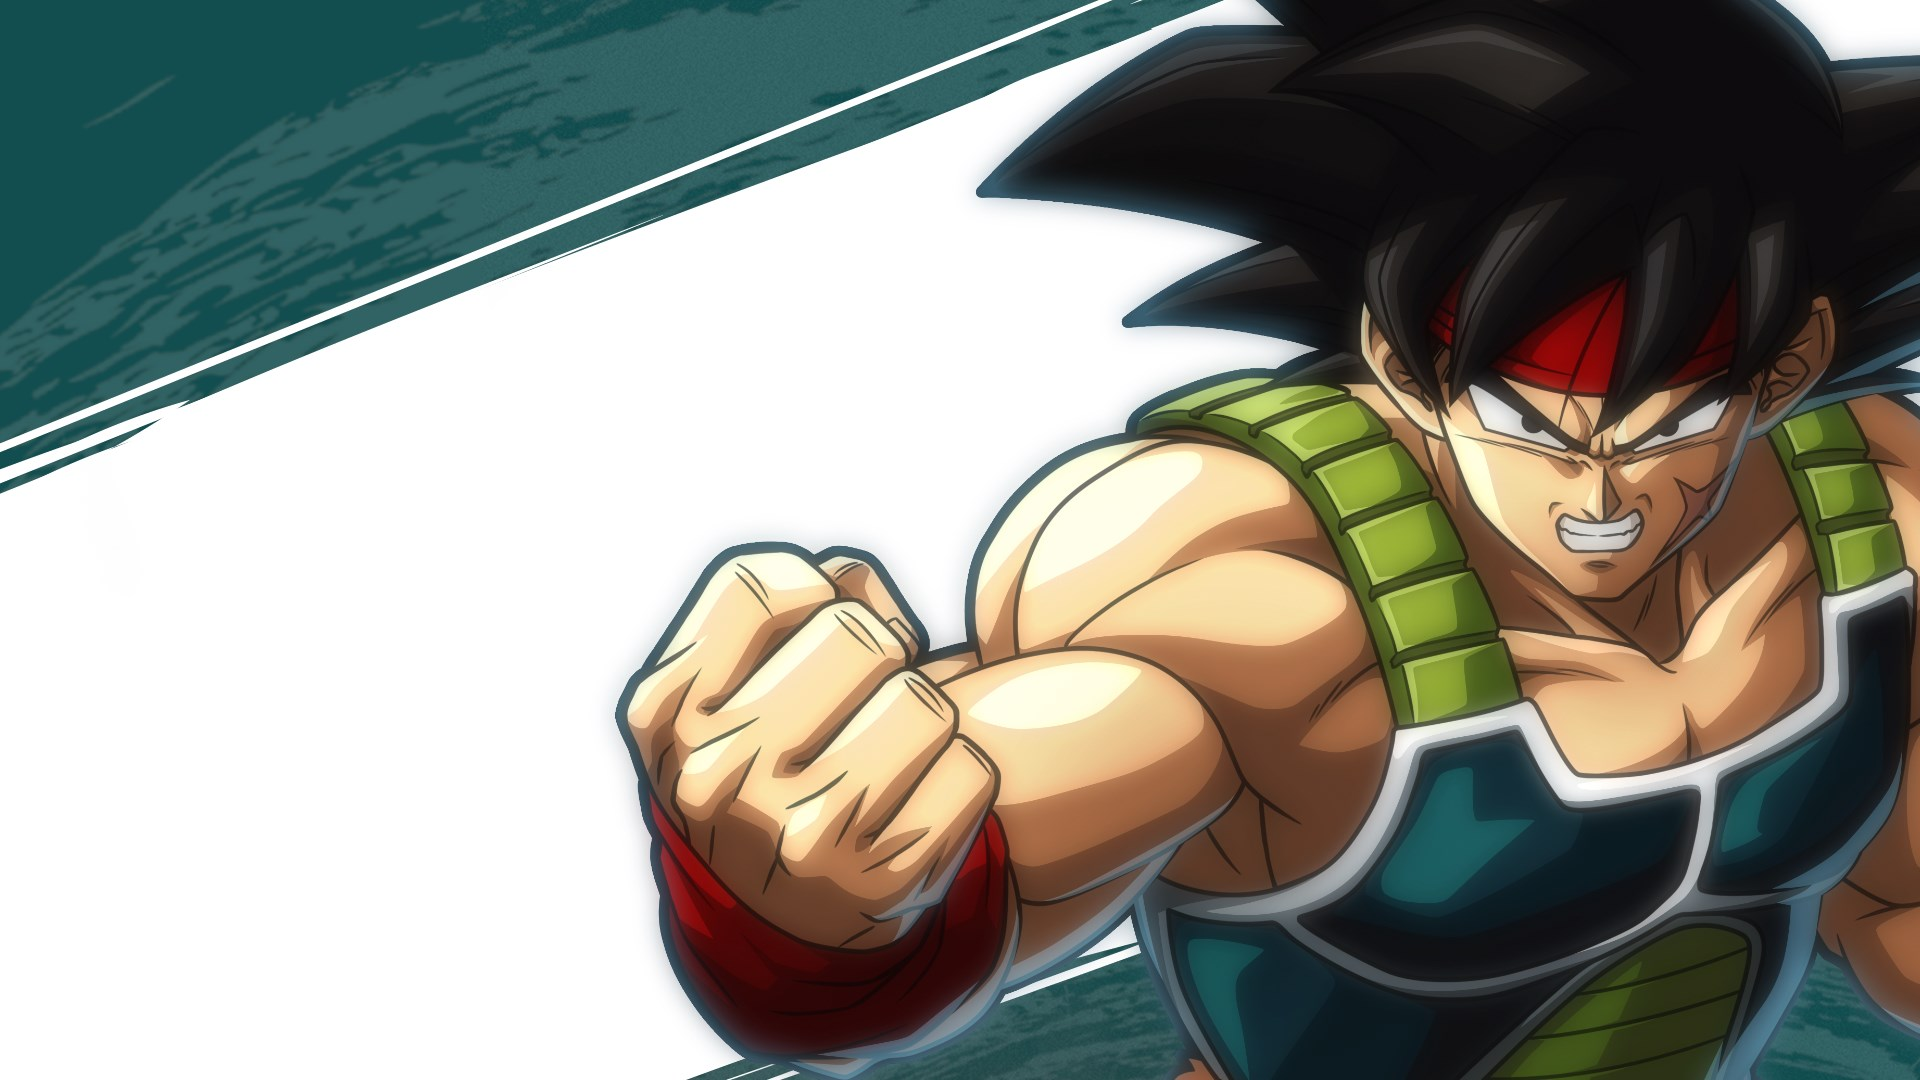 DRAGON BALL FIGHTERZ - Bardock